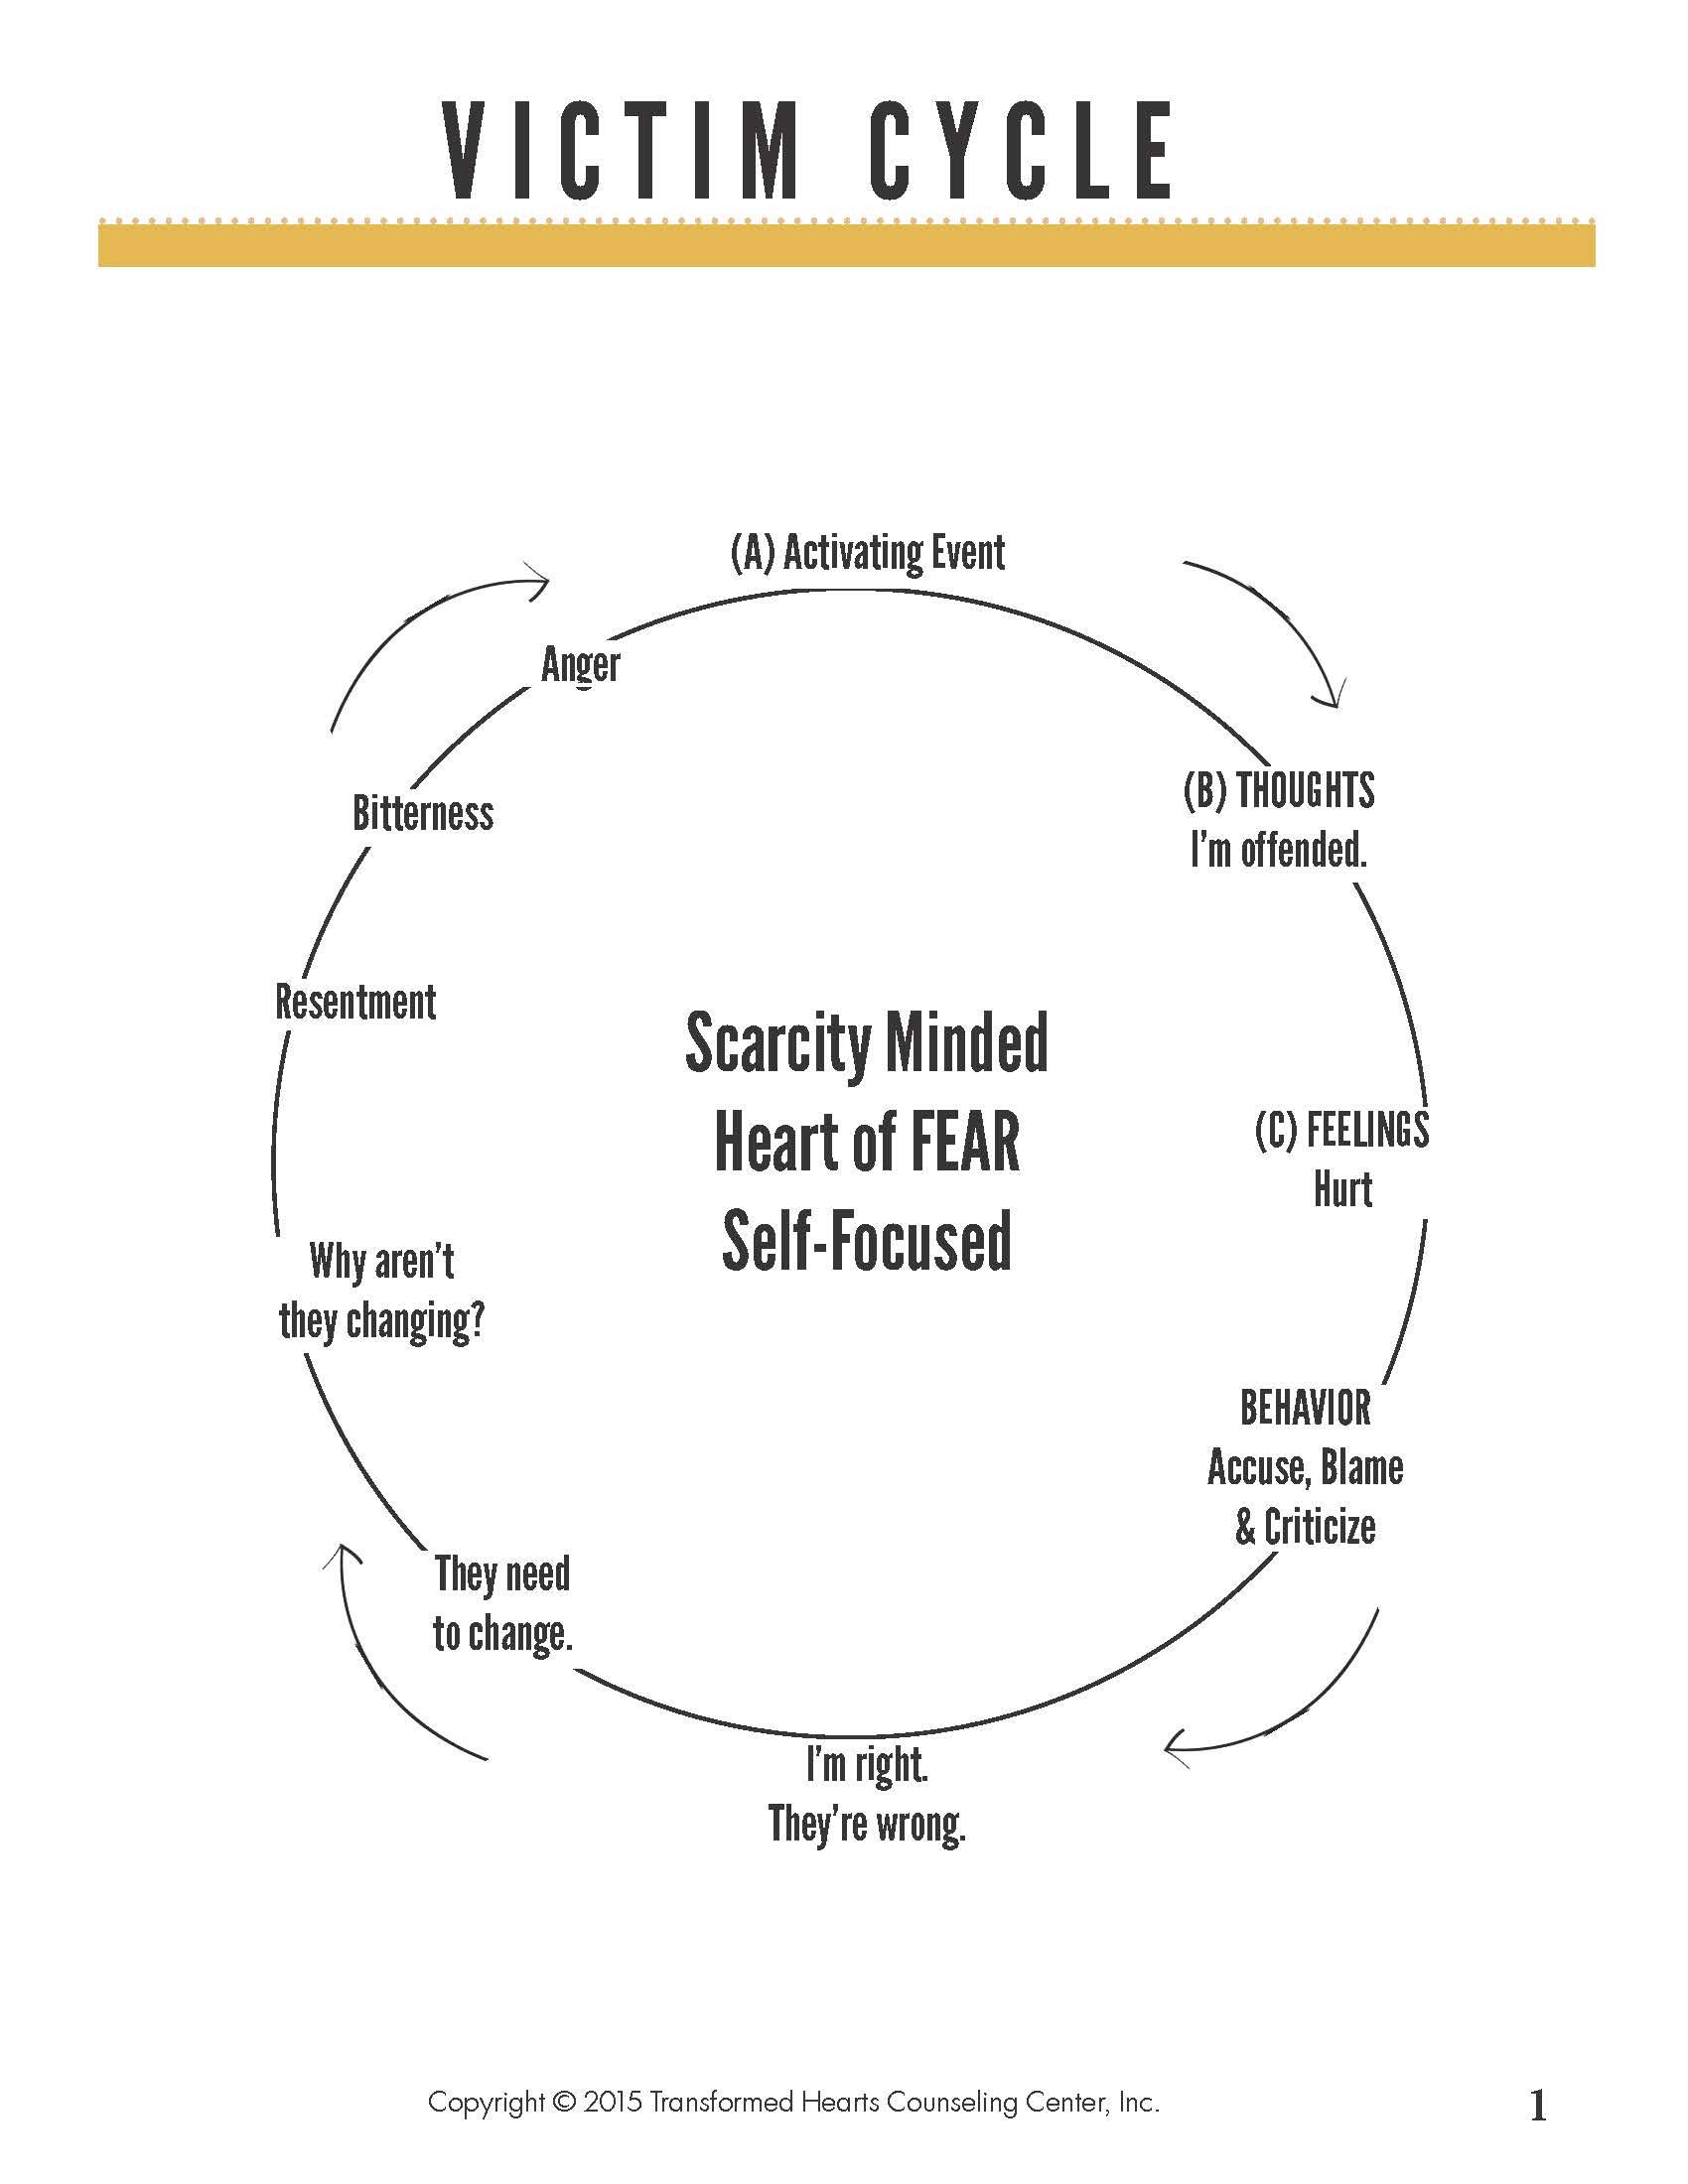 2016 Victim Cycle